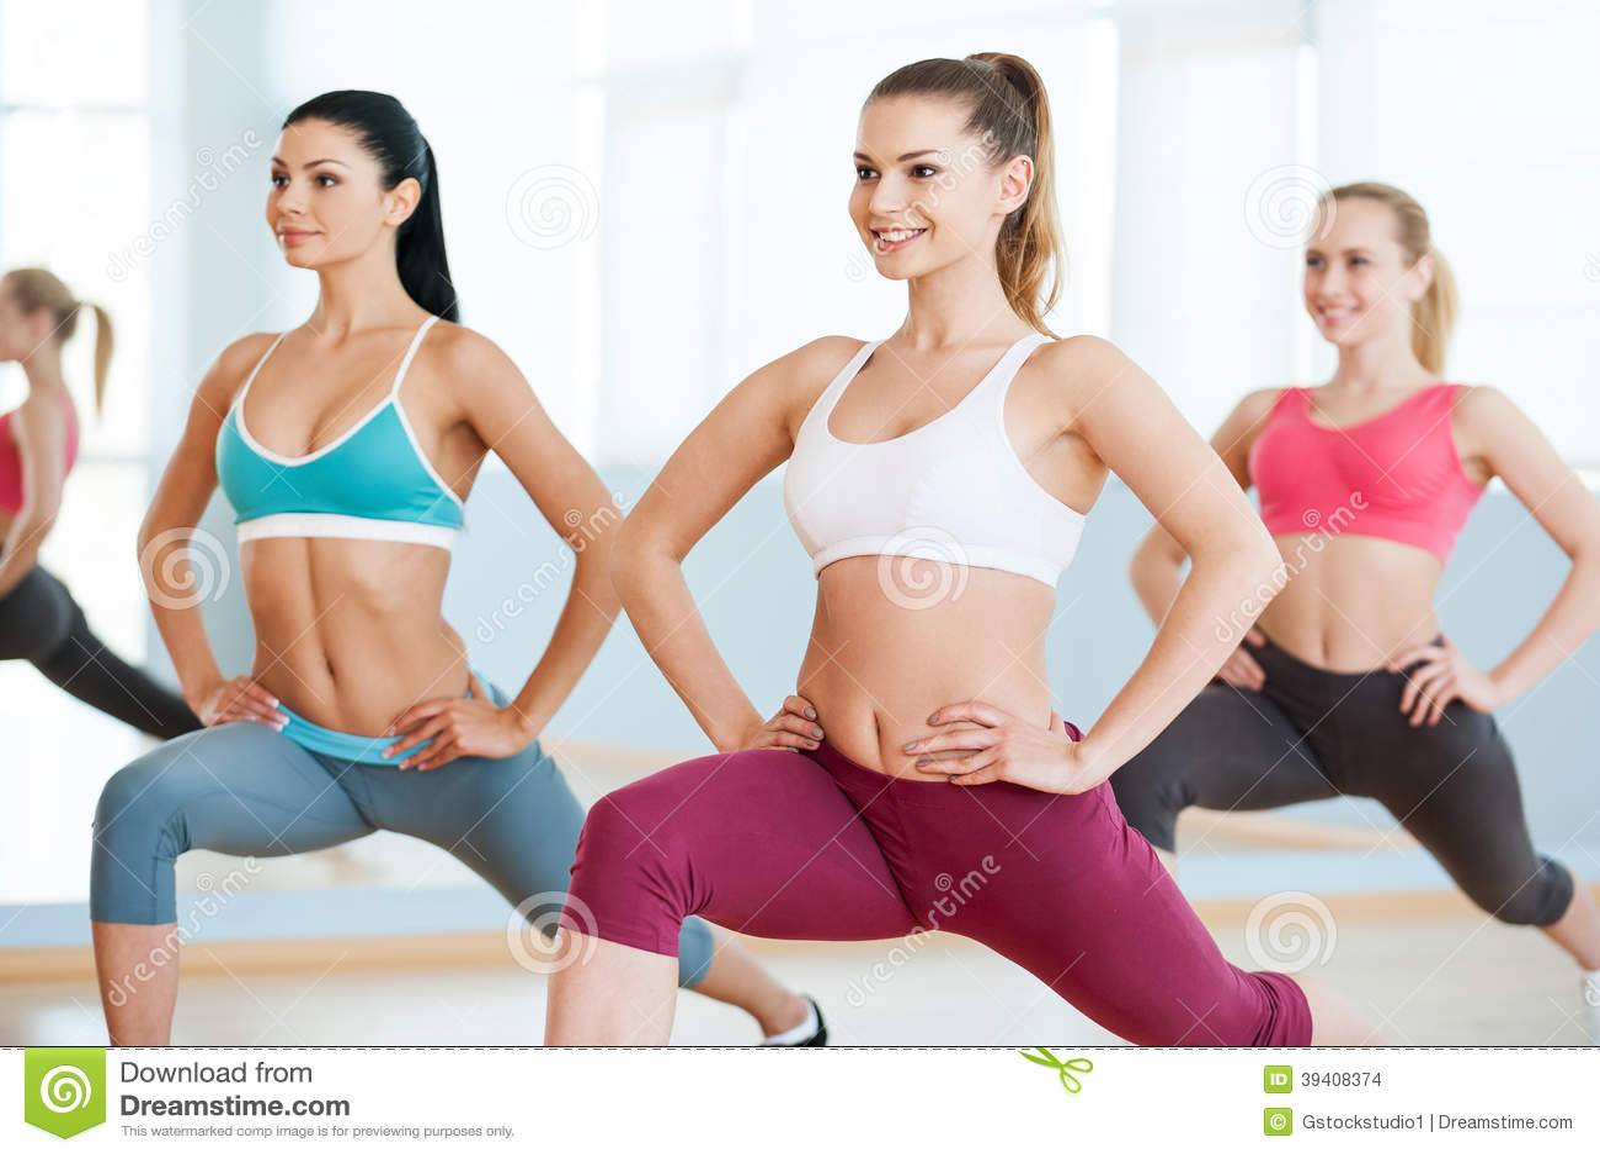 Sexy aerobics girls